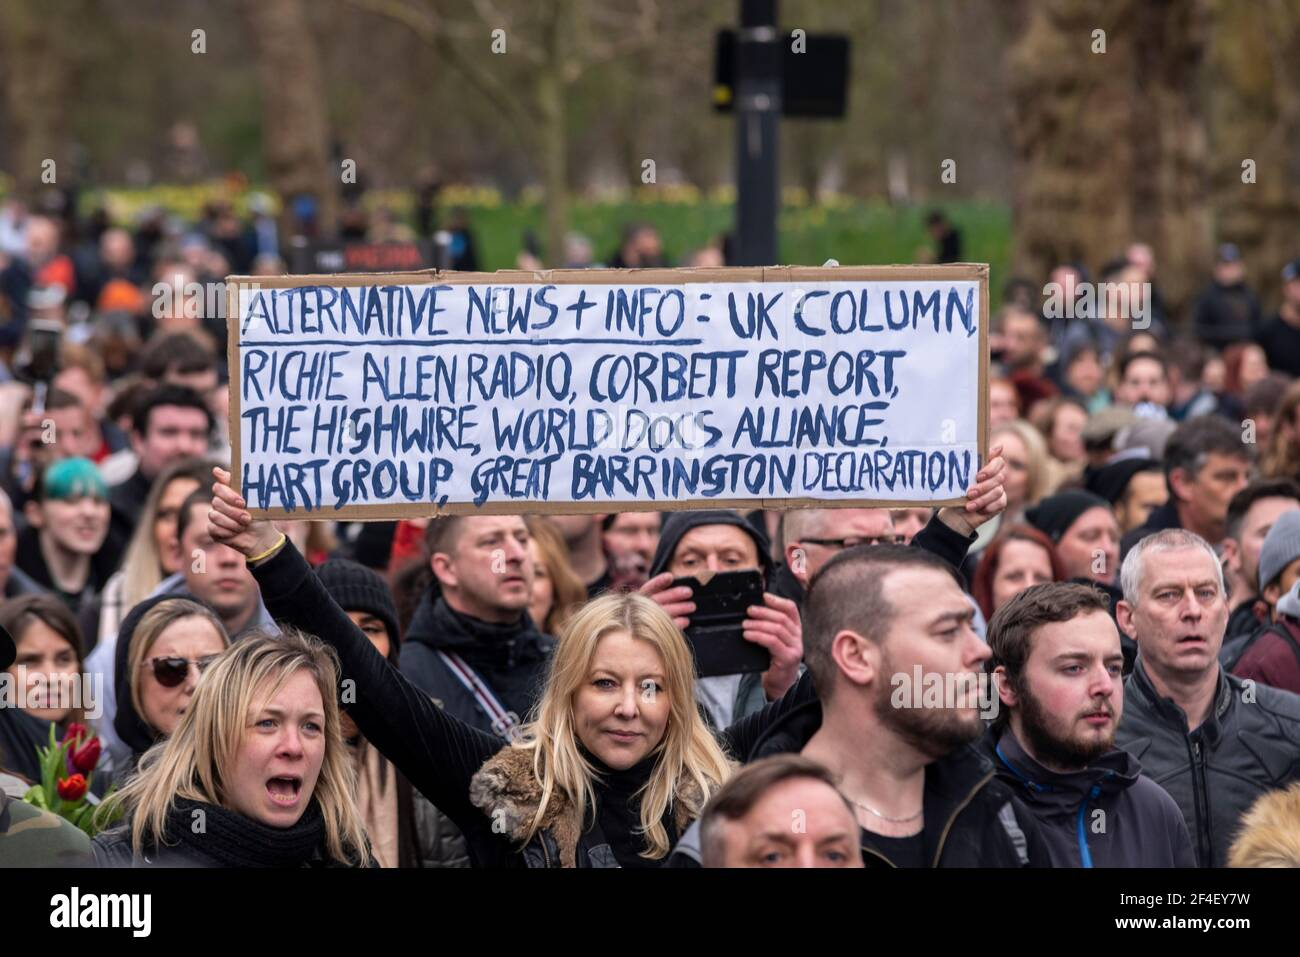 placard-at-a-covid-19-anti-lockdown-protest-march-in-westminster-london-uk-alternative-news-uk-column-richie-allen-radio-corbett-report-2F4EY7W.jpg